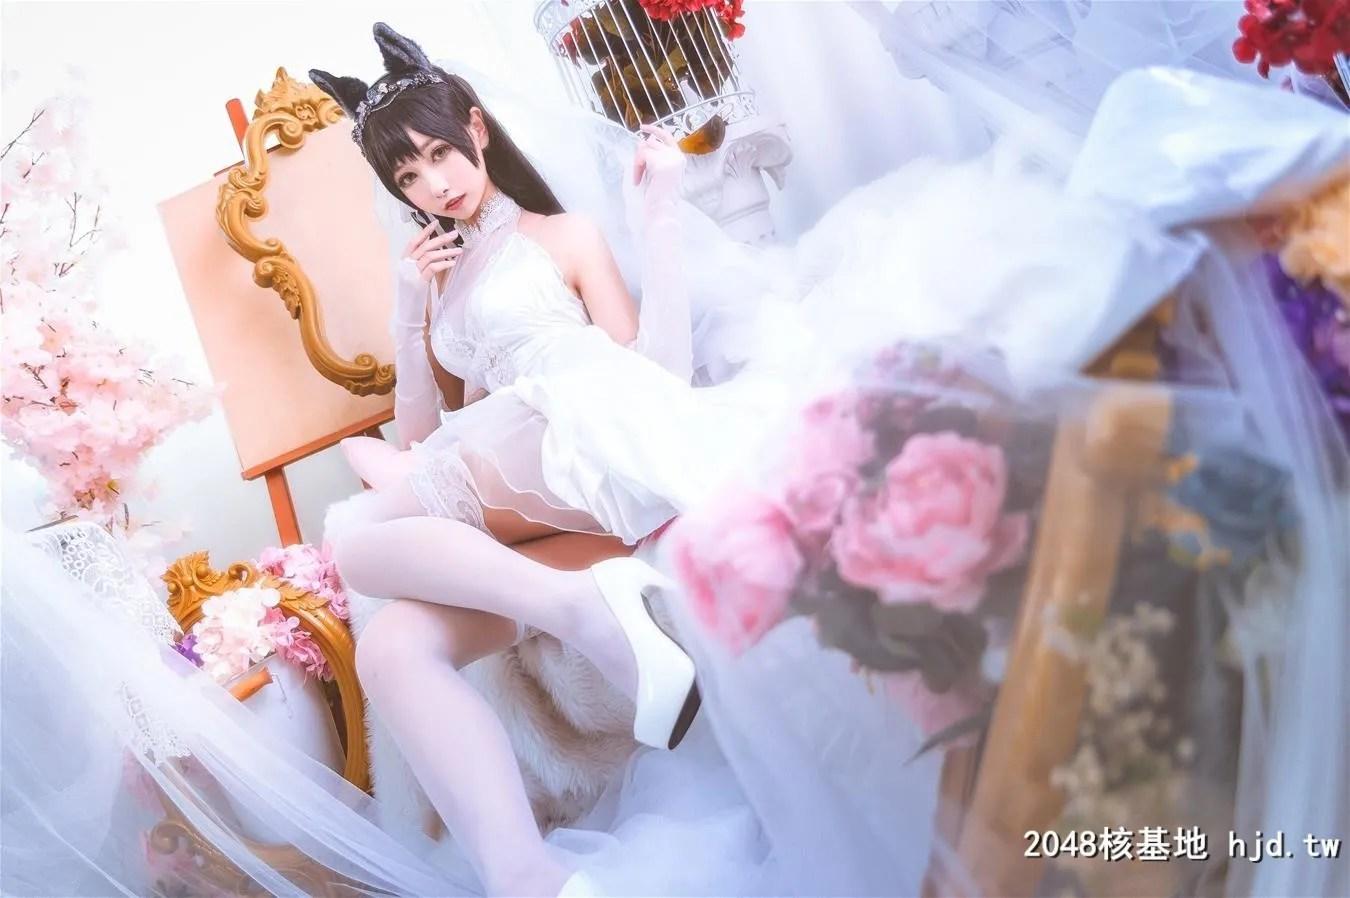 【Momoko葵葵】 爱宕 [26P]插图(11)